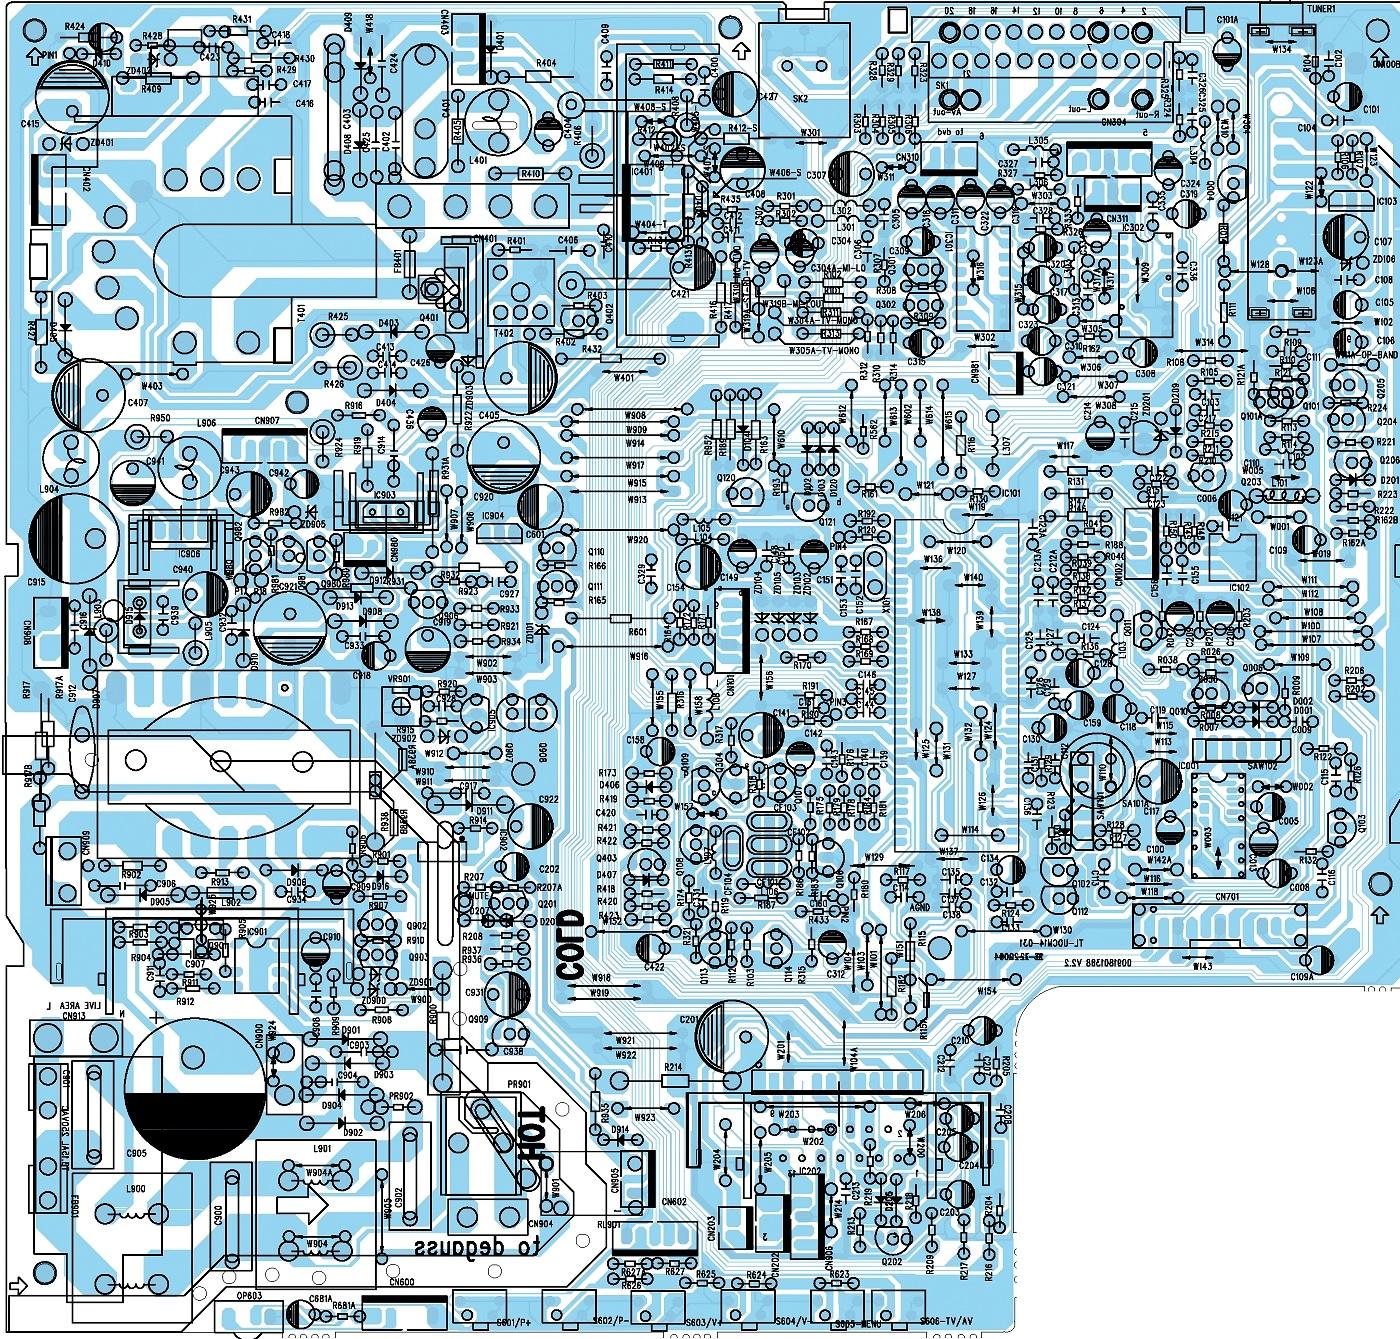 grundig k15 pfcd 2602 txt crt tv dvd service mode adjustments main board circuit diagram